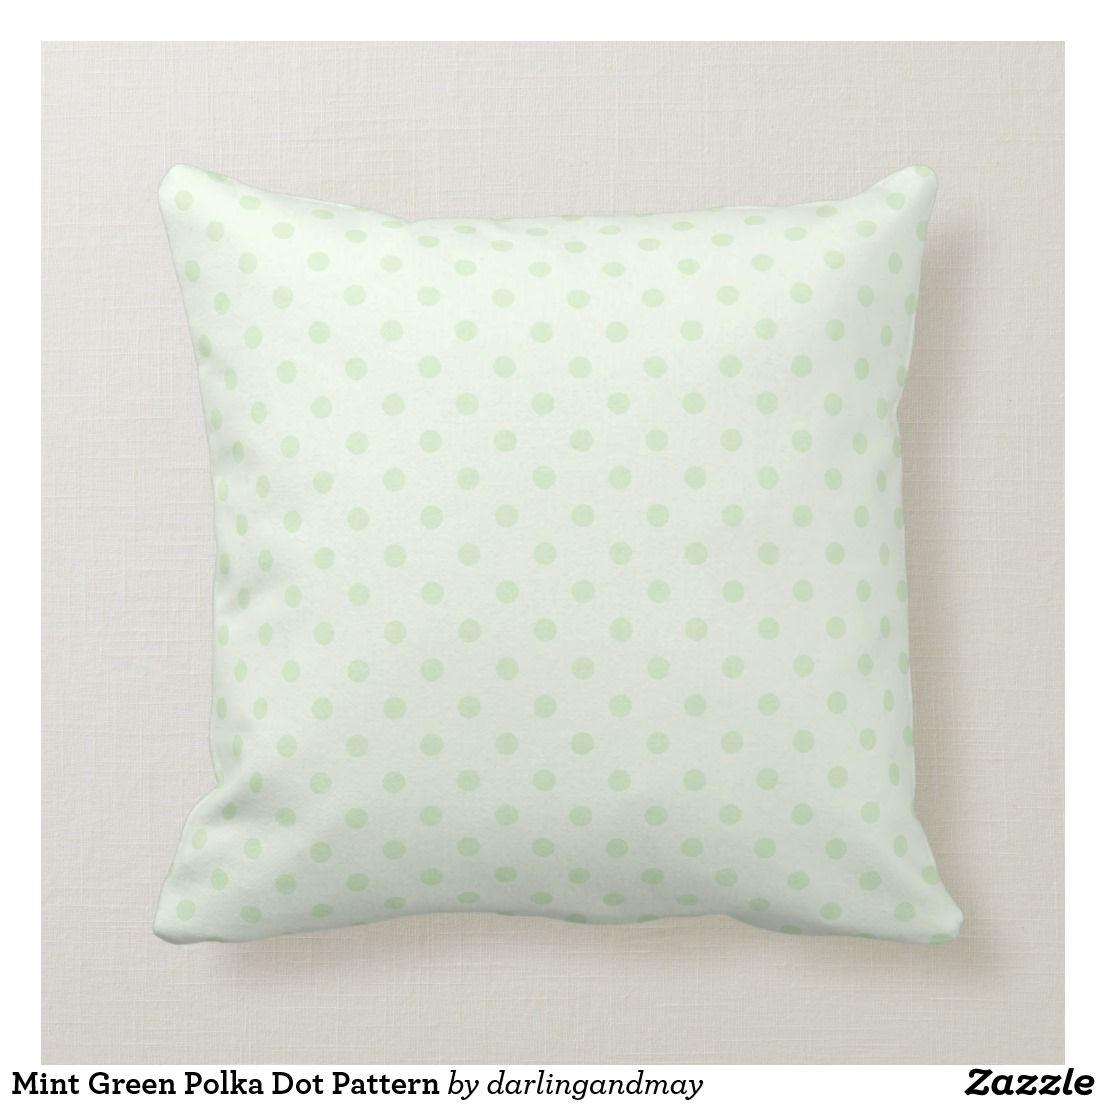 Cool Mint Green Polka Dot Pattern Throw Pillow Zazzle Com Machost Co Dining Chair Design Ideas Machostcouk